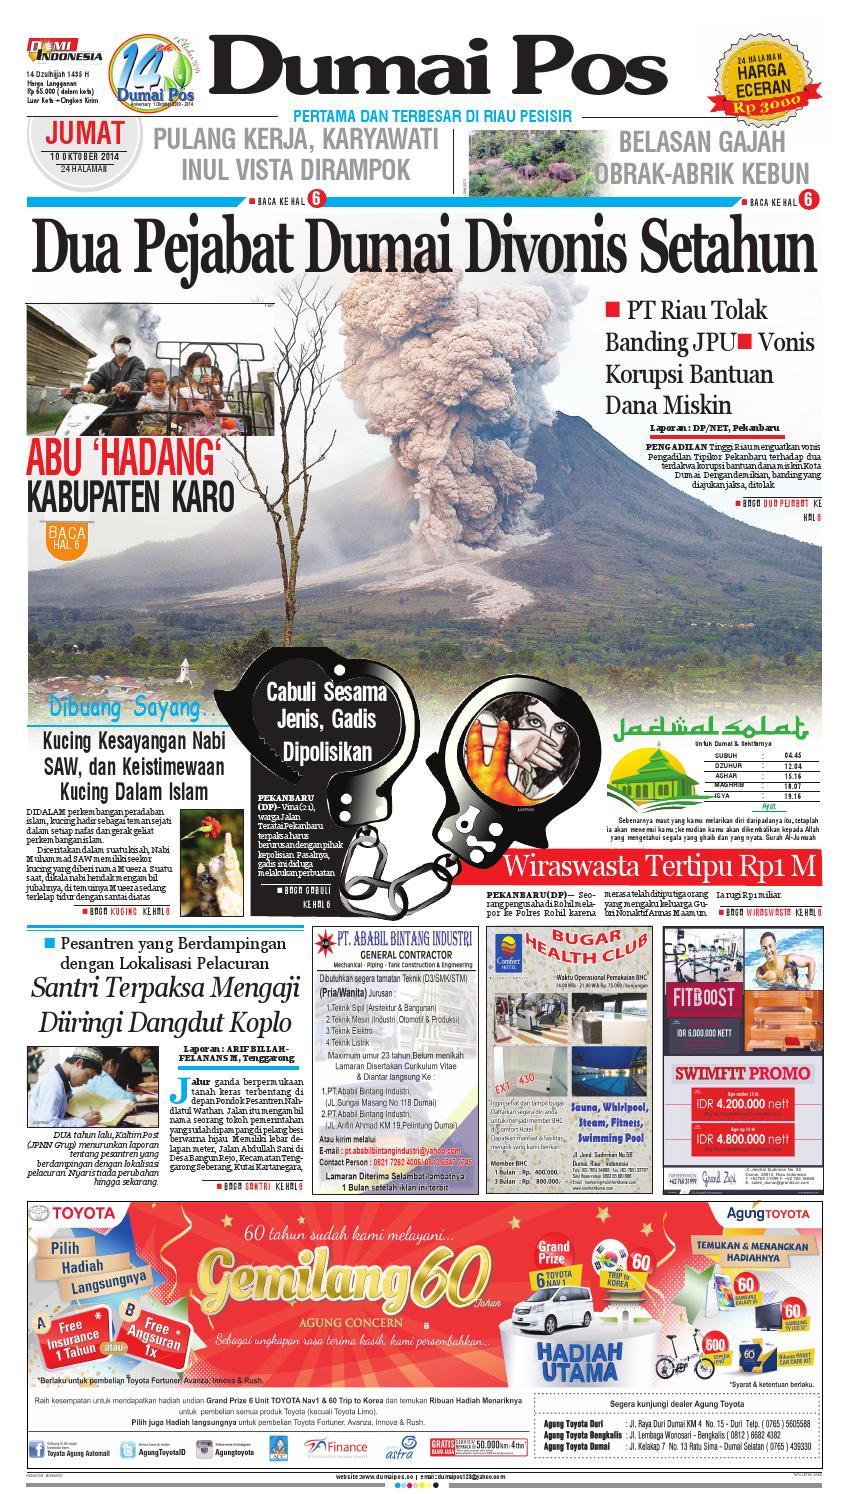 Dumaipos 10 Oktober 2014 By Dumai Pos Issuu Produk Ukm Bumn Sambal Bawang Goreng Maklin